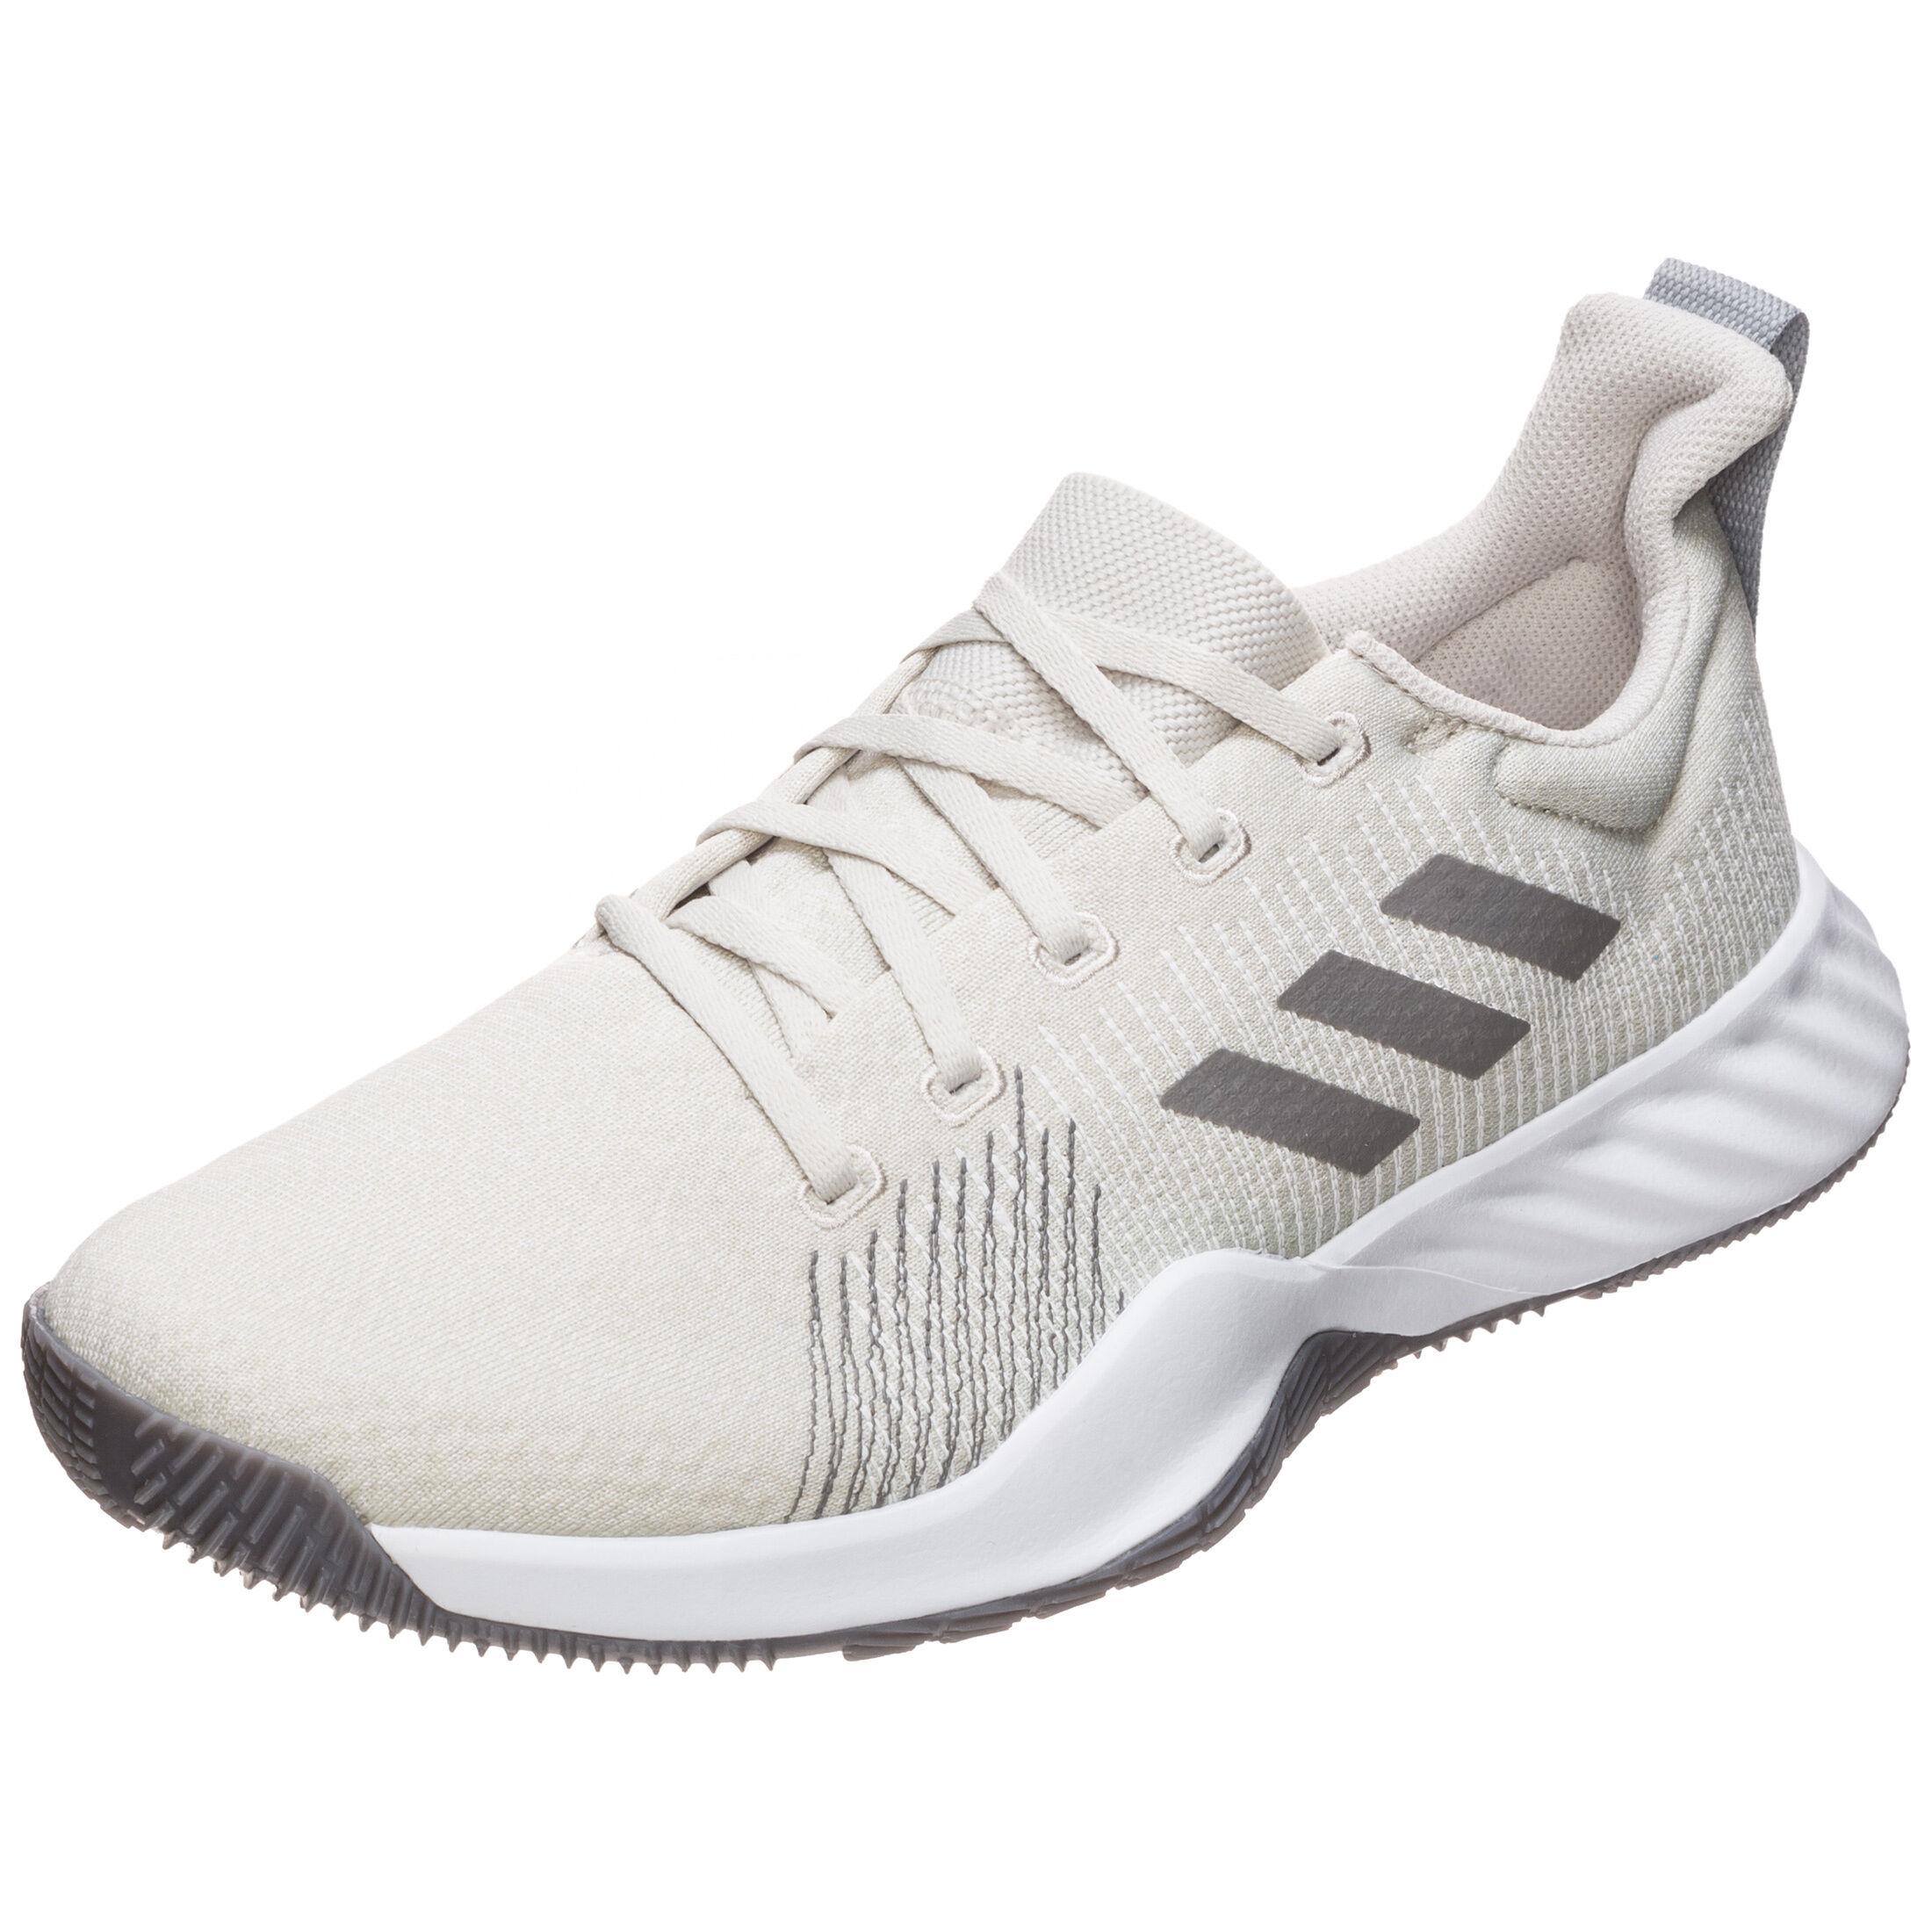 adidas Performance Solar LT Trainingsschuh Herren